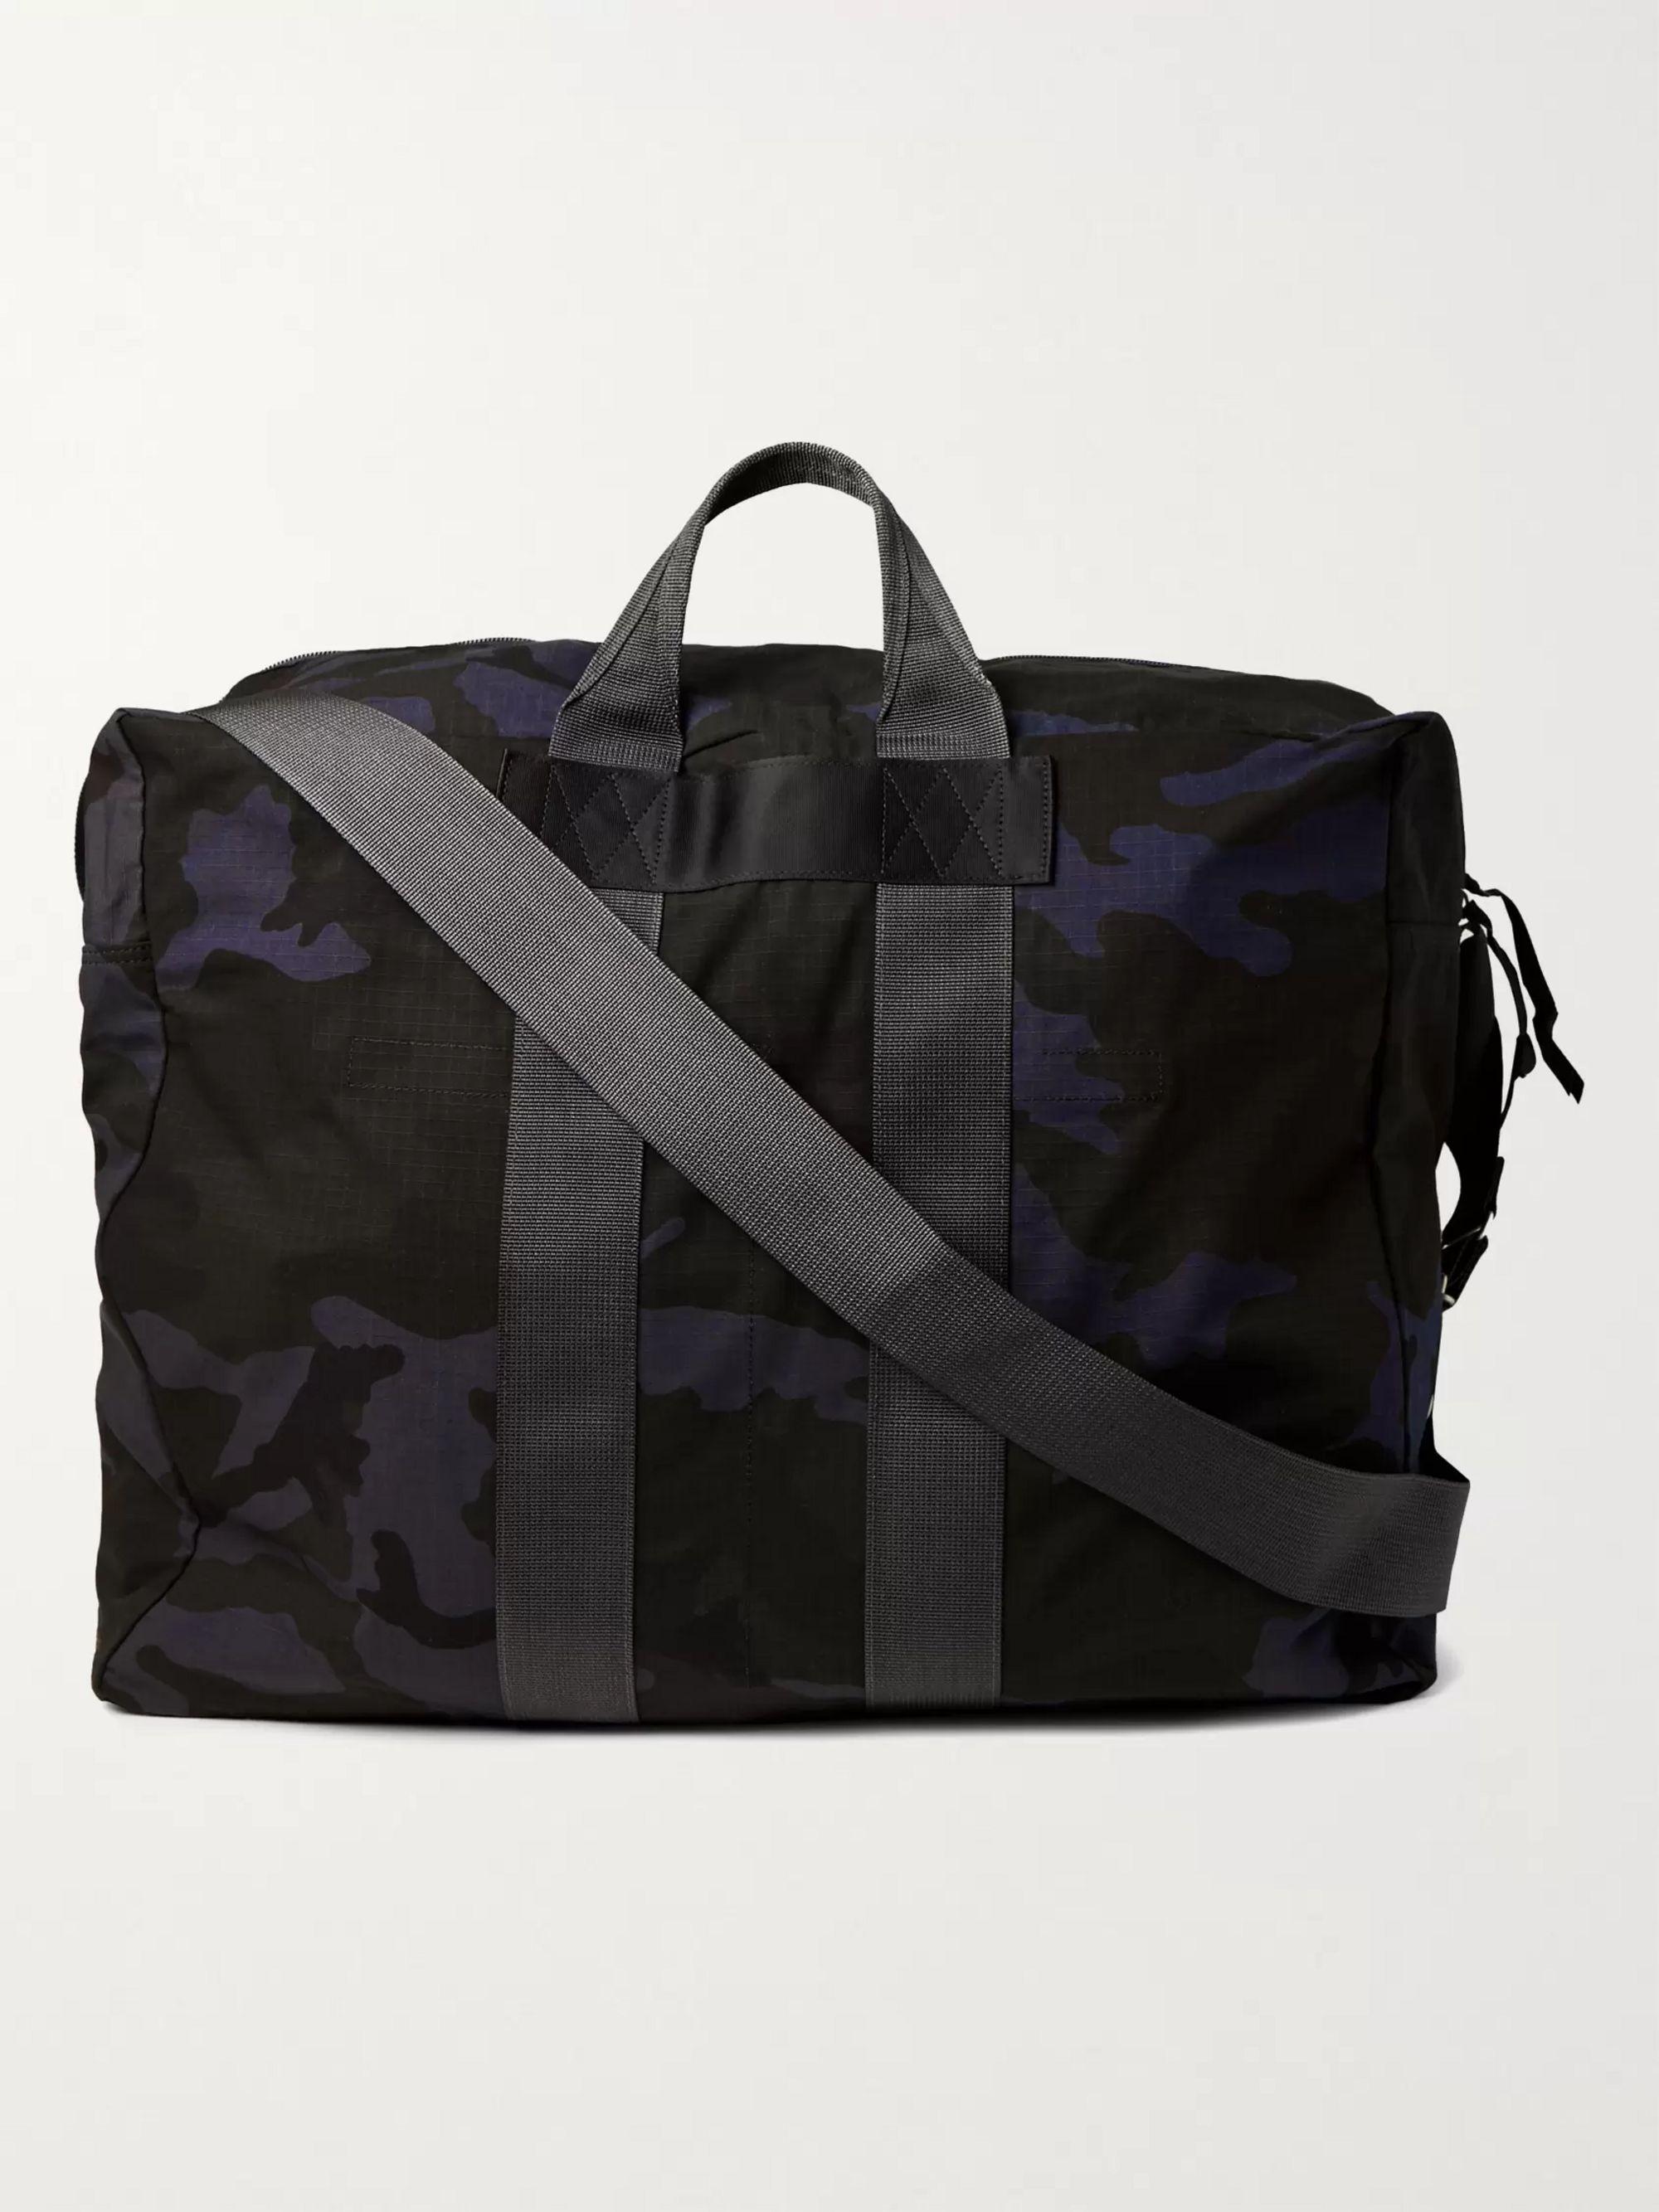 PORTER-YOSHIDA & CO Camouflage-Print Nylon and Cotton-Ripstop Tote Bag,Navy